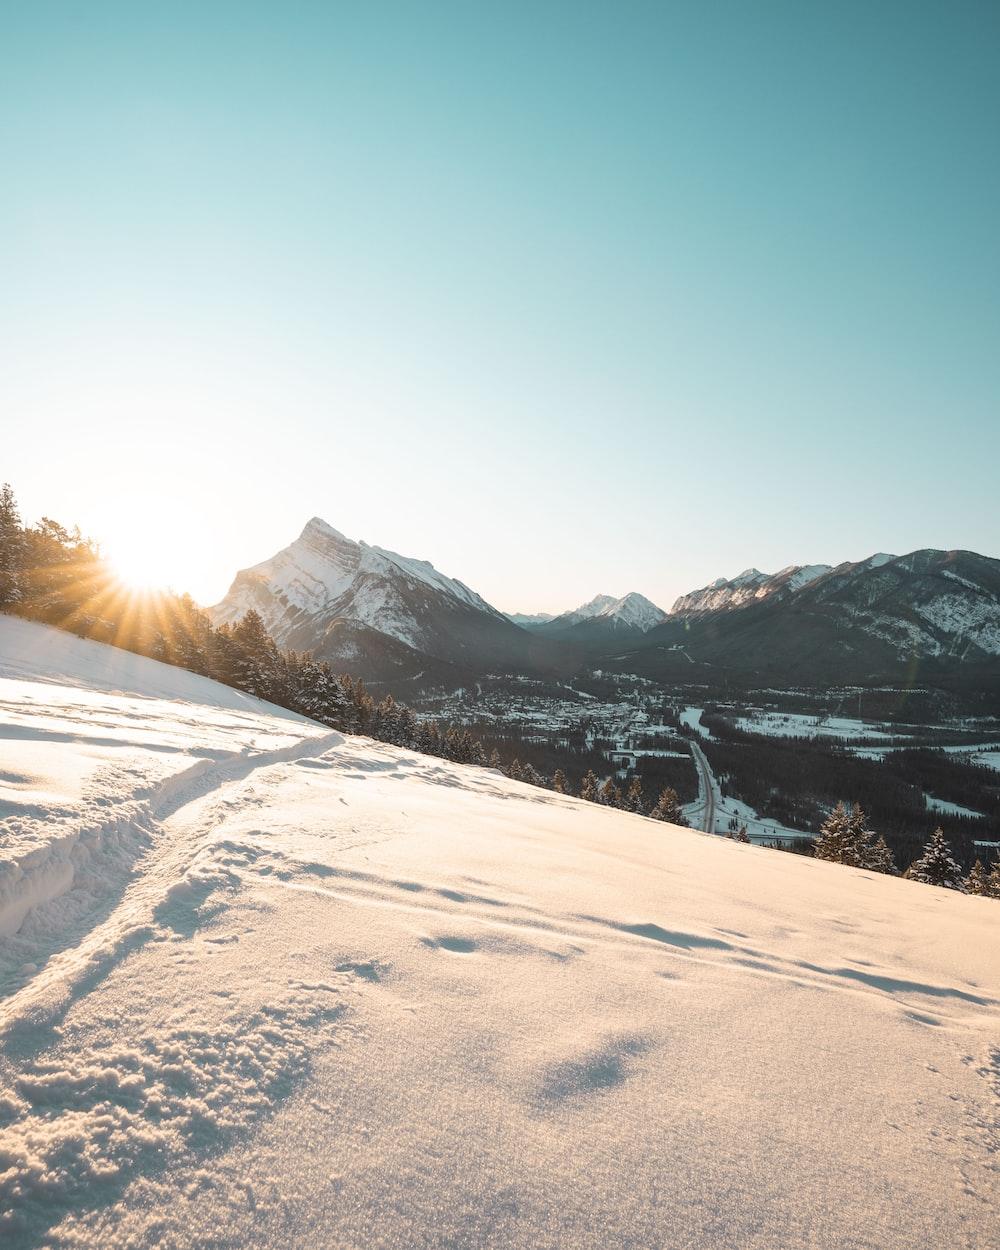 white mountain during daytime